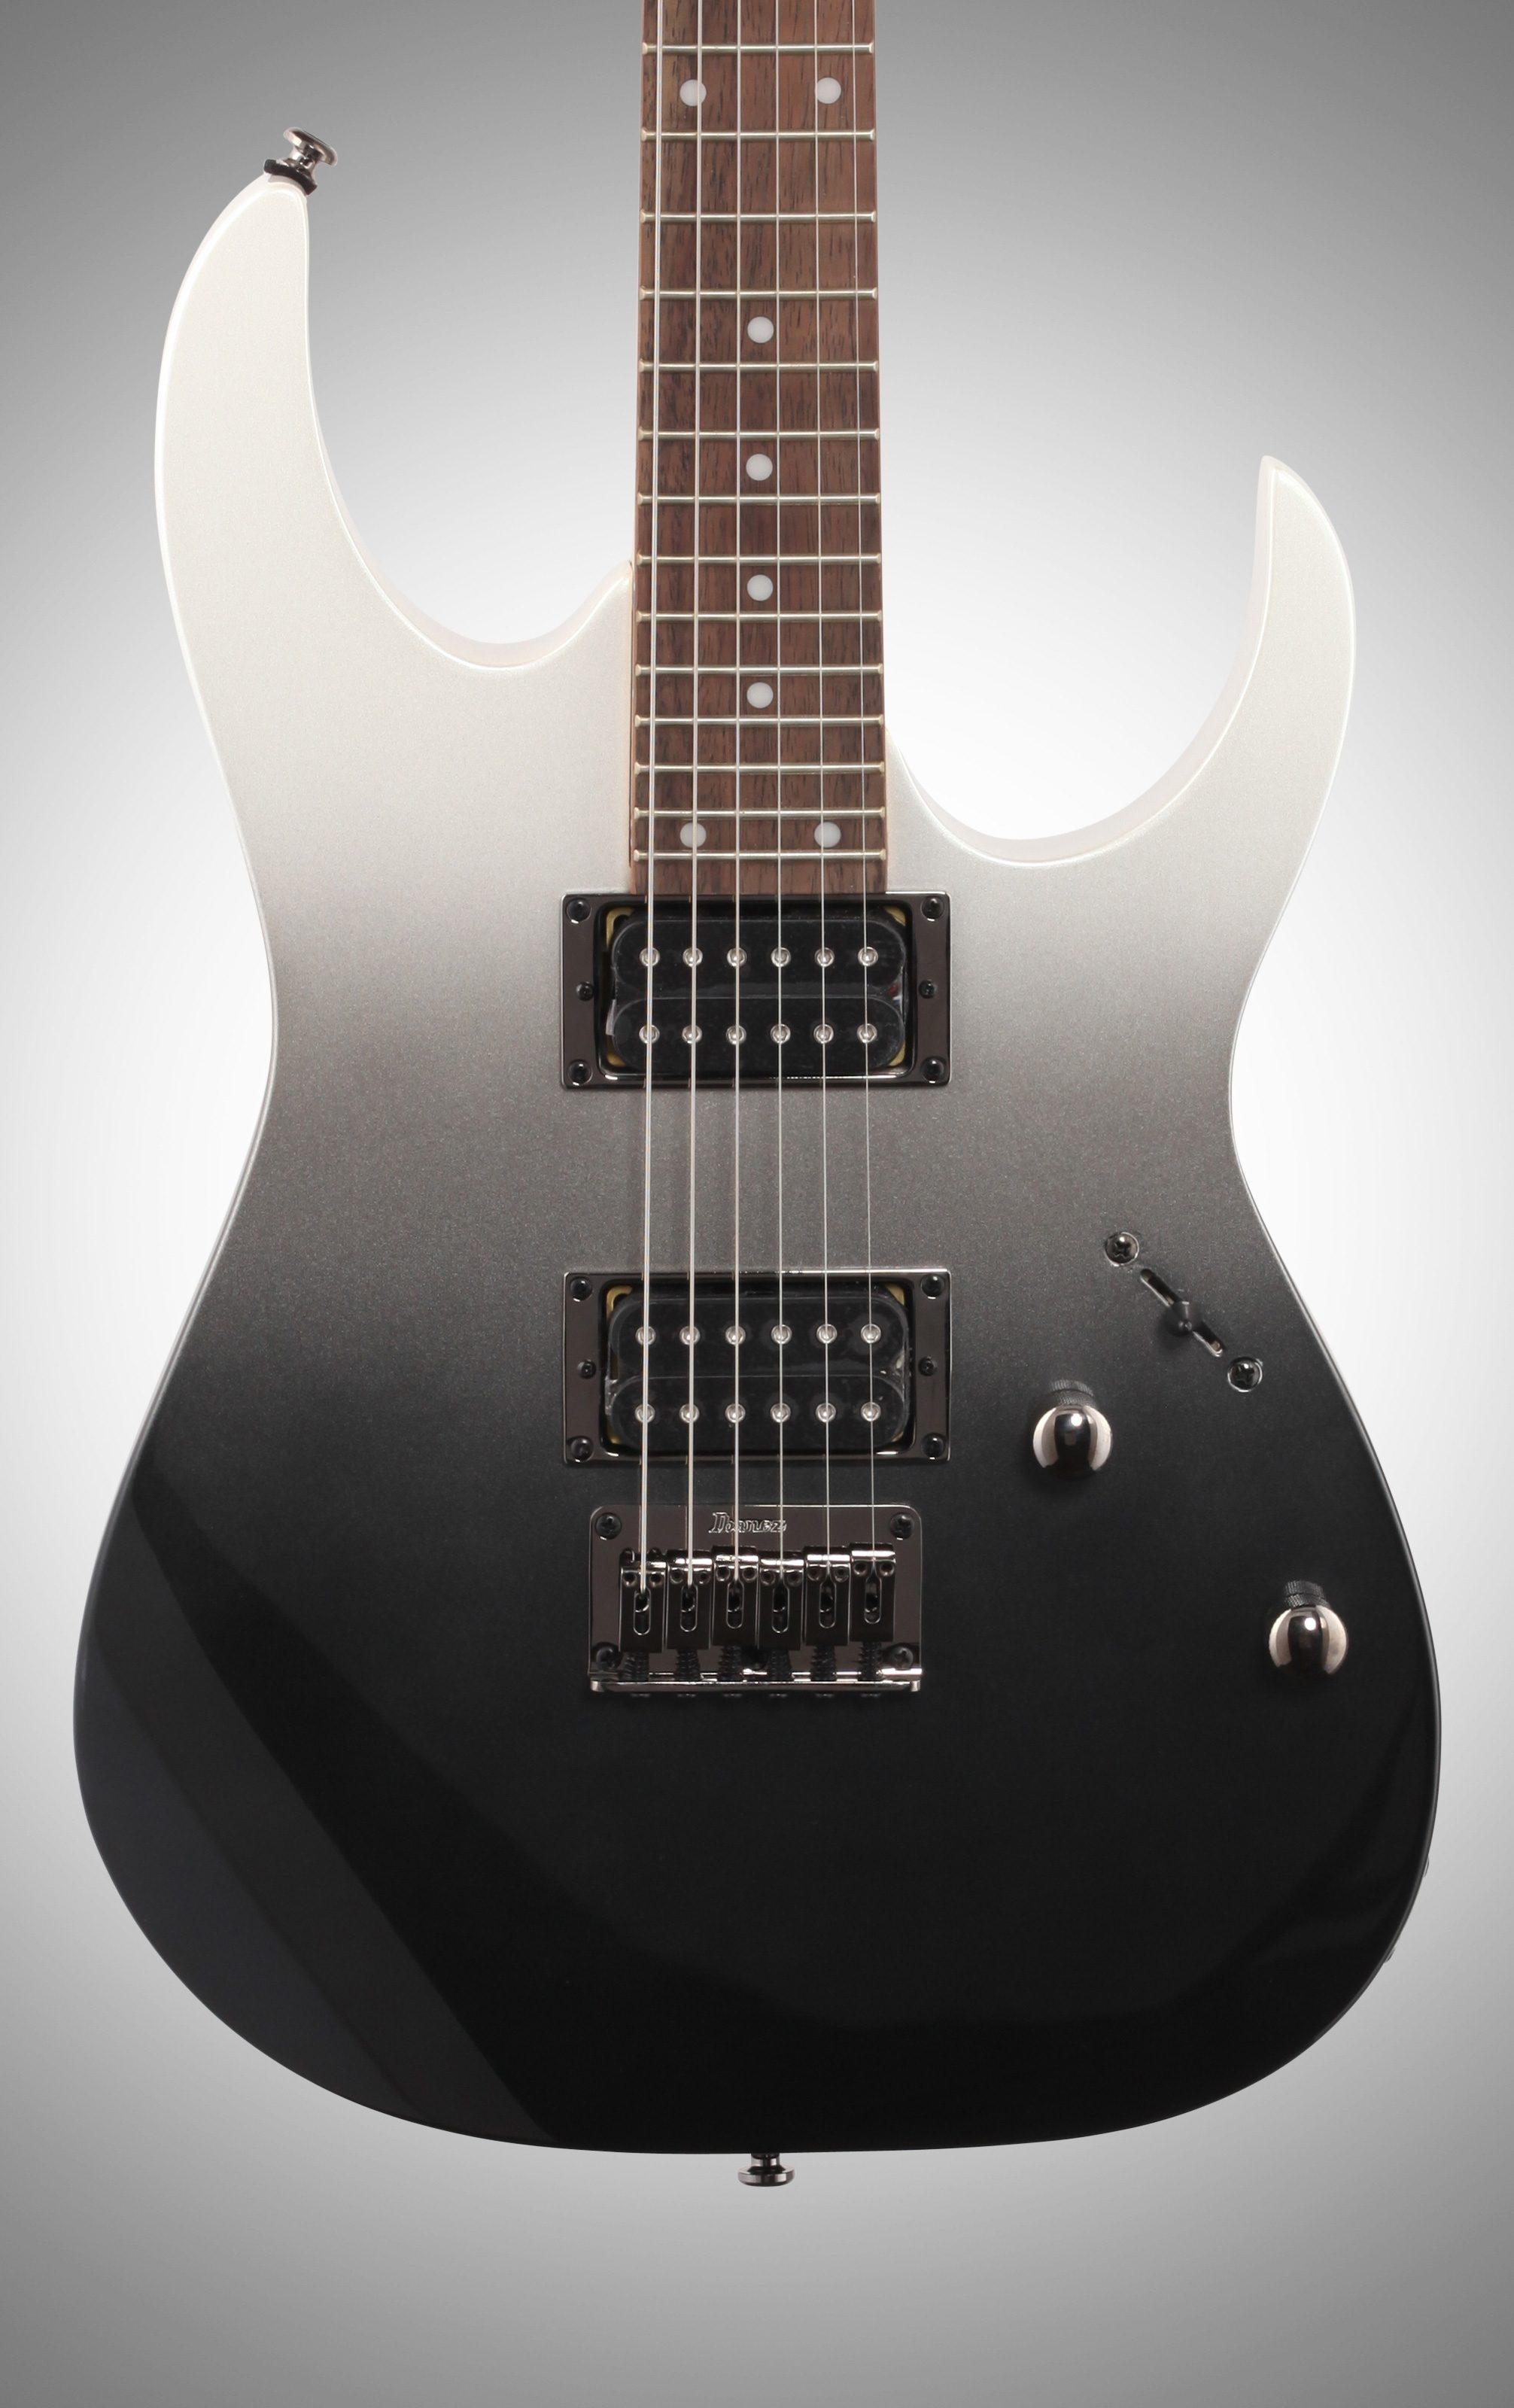 Ibanez Rg421 Rg Electric Guitar With Fixed Bridge Black